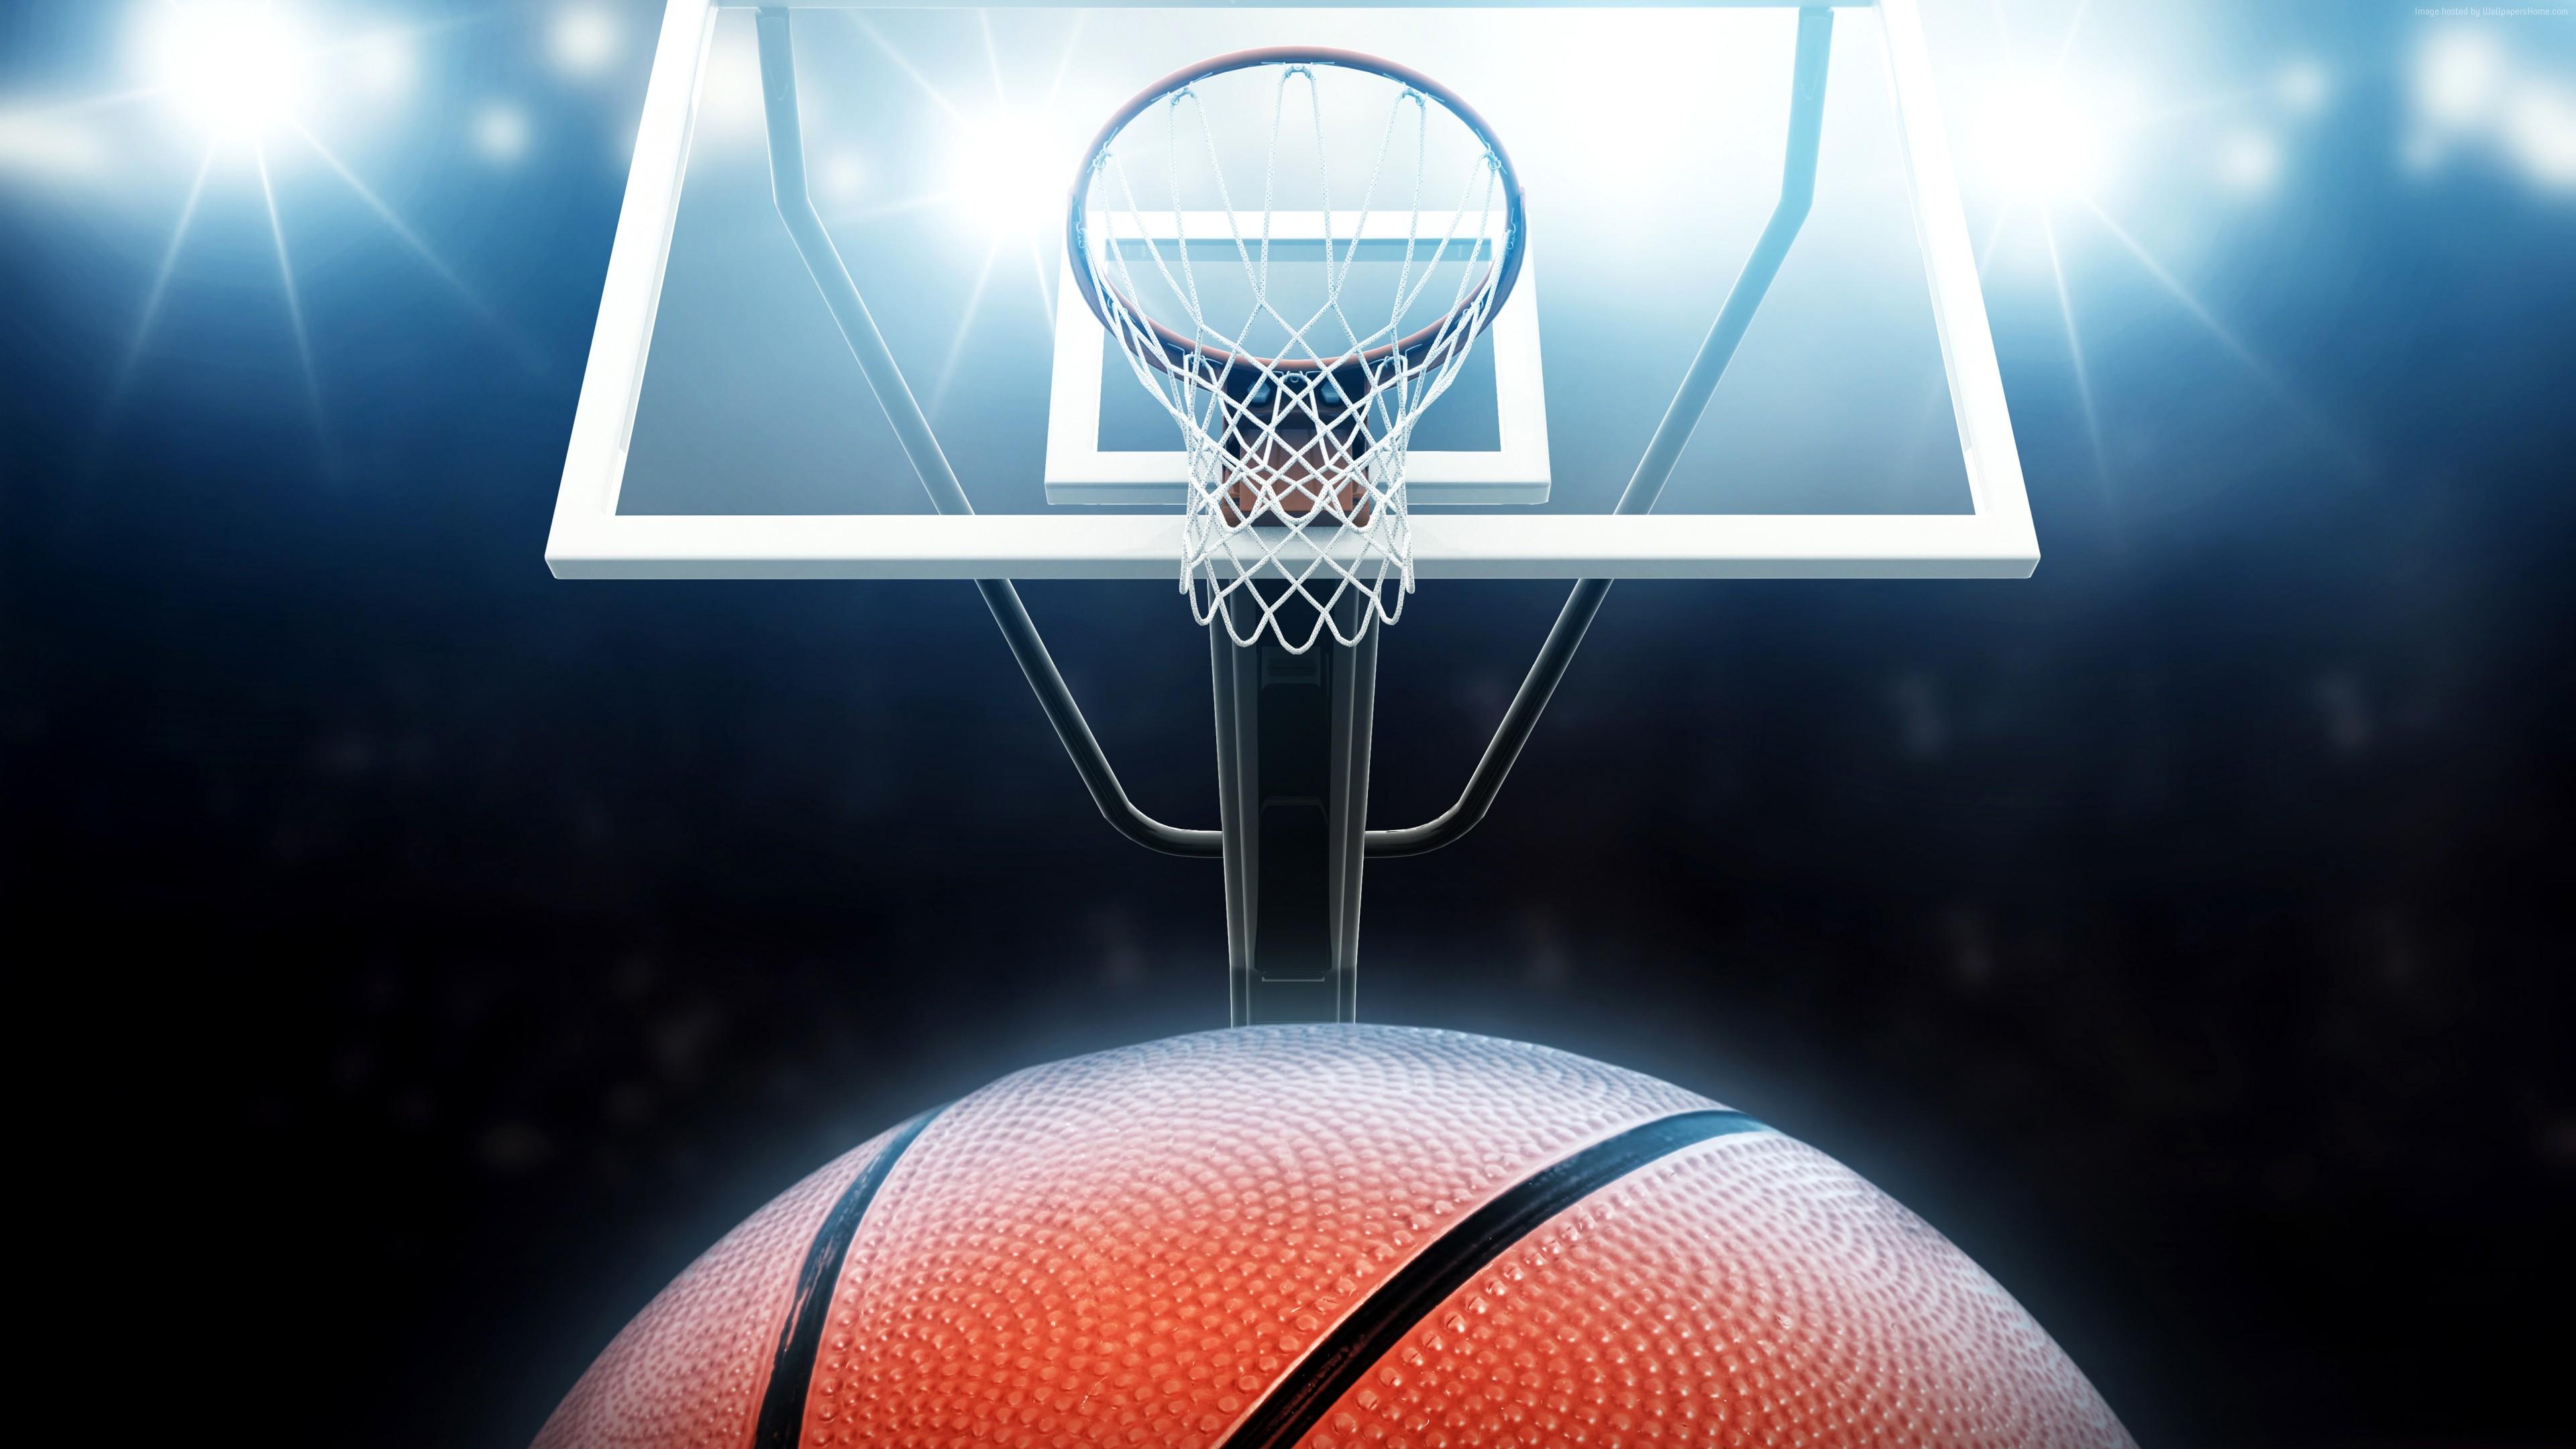 Wallpaper 4k Basketball 4k basketball wallpapers sports wallpapers 3840x2160